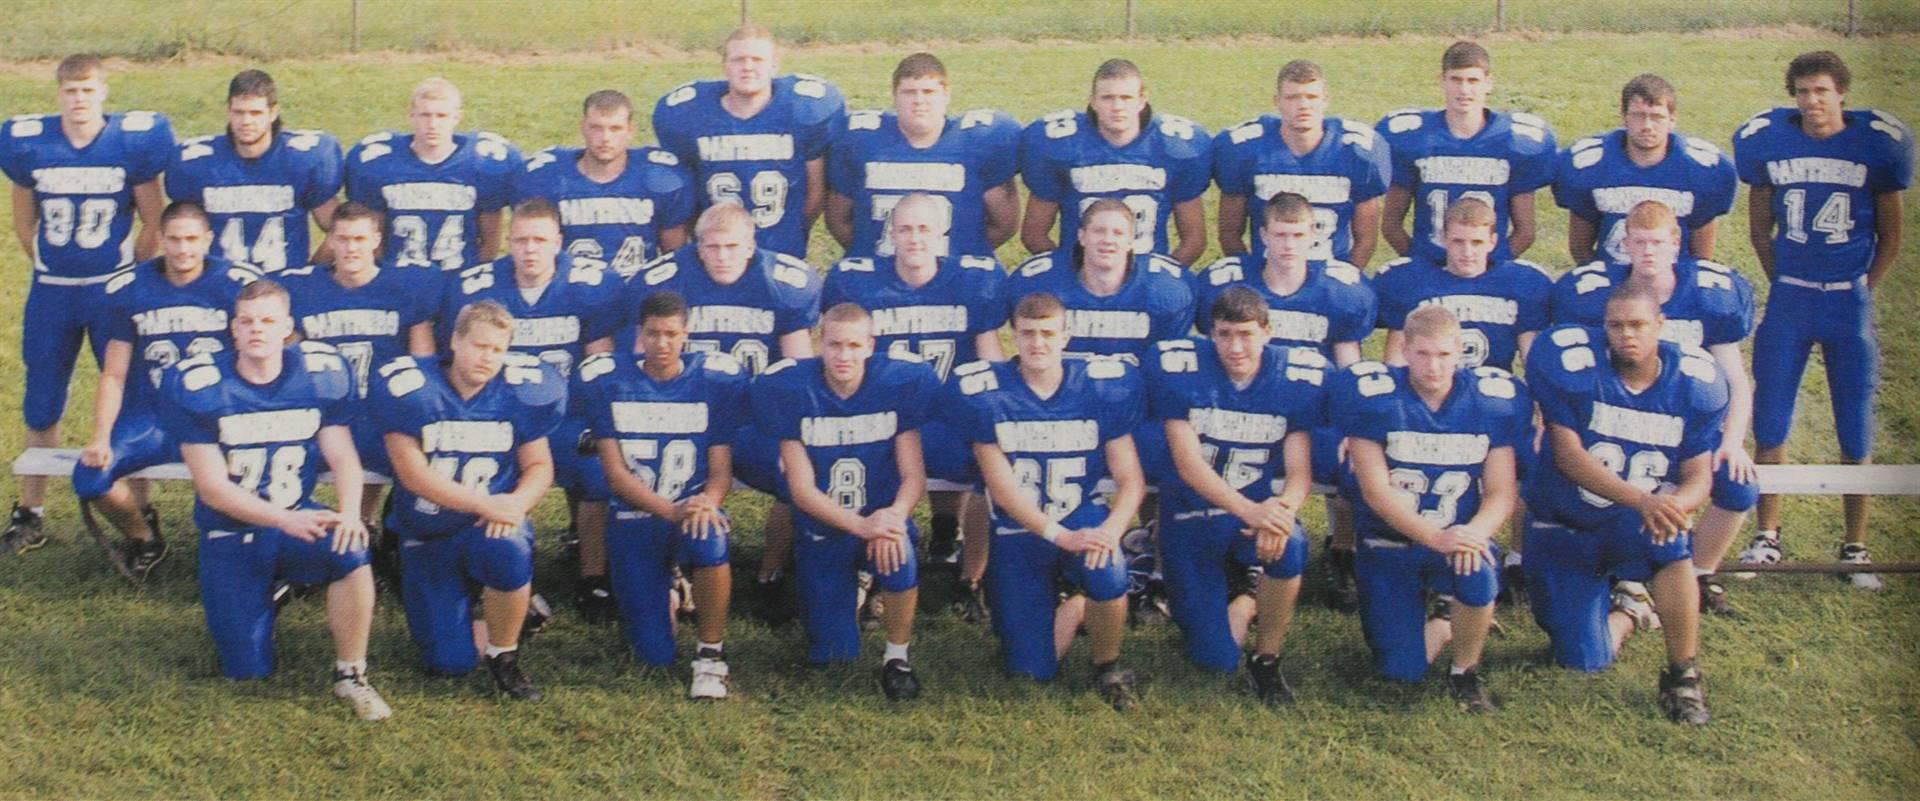 2004 Football